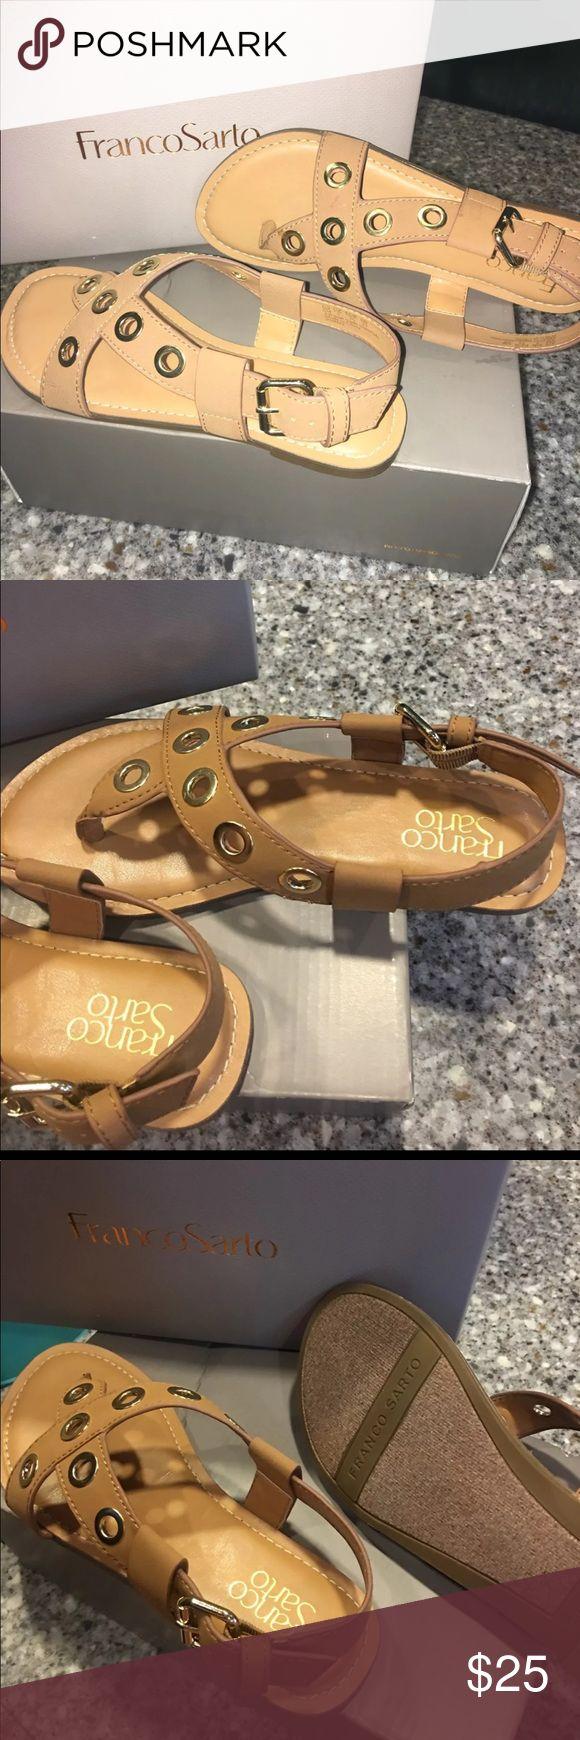 Franco Sarto sandals Brand new, never worn Franco Sarto sandals in size 6. Franco Sarto Shoes Sandals